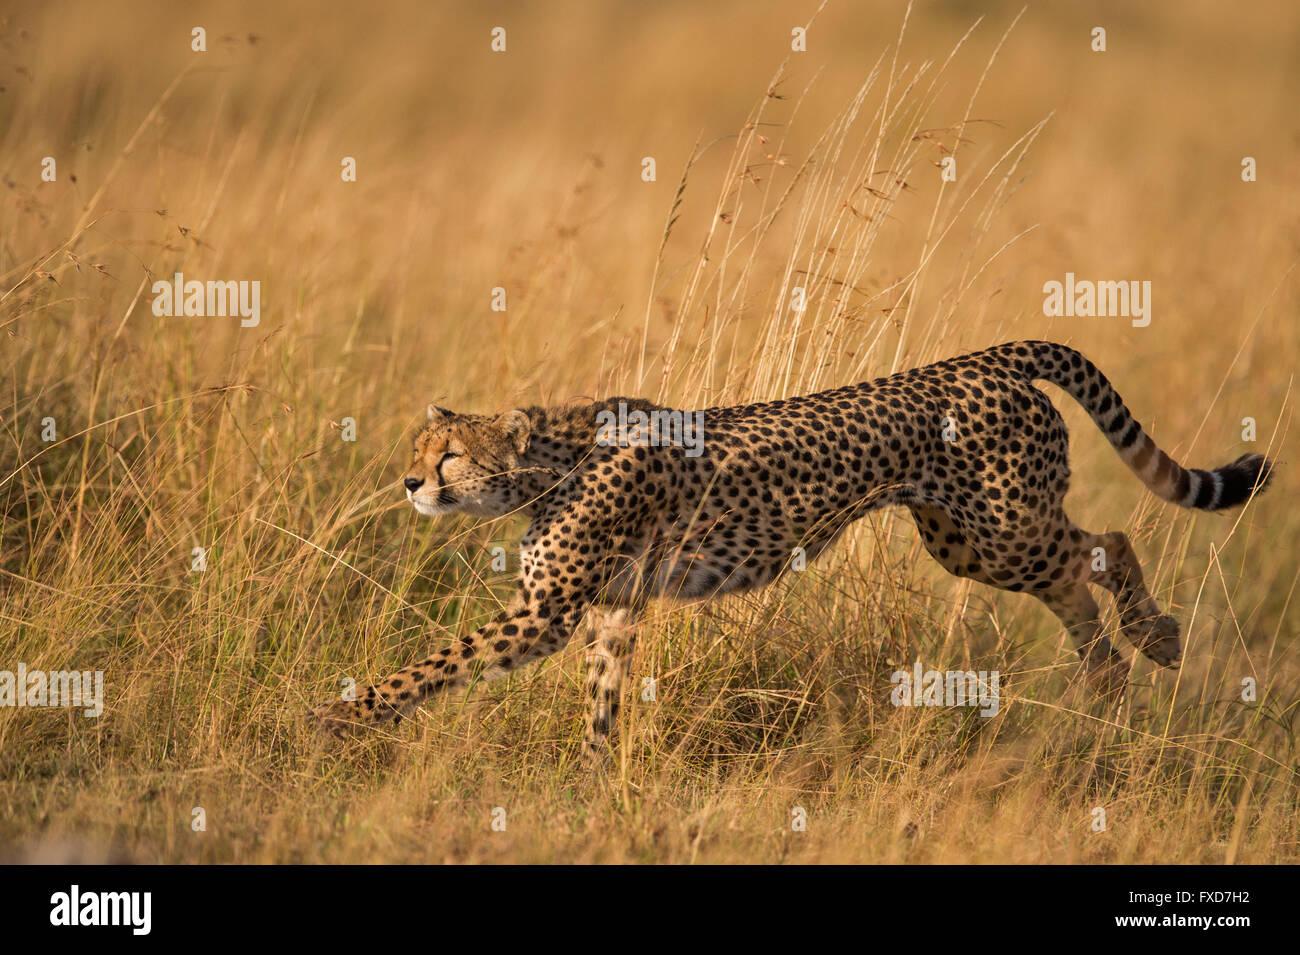 Cheetah  (Acinonyx jubatus) running in a grassland in Masai Mara, Kenya - Stock Image